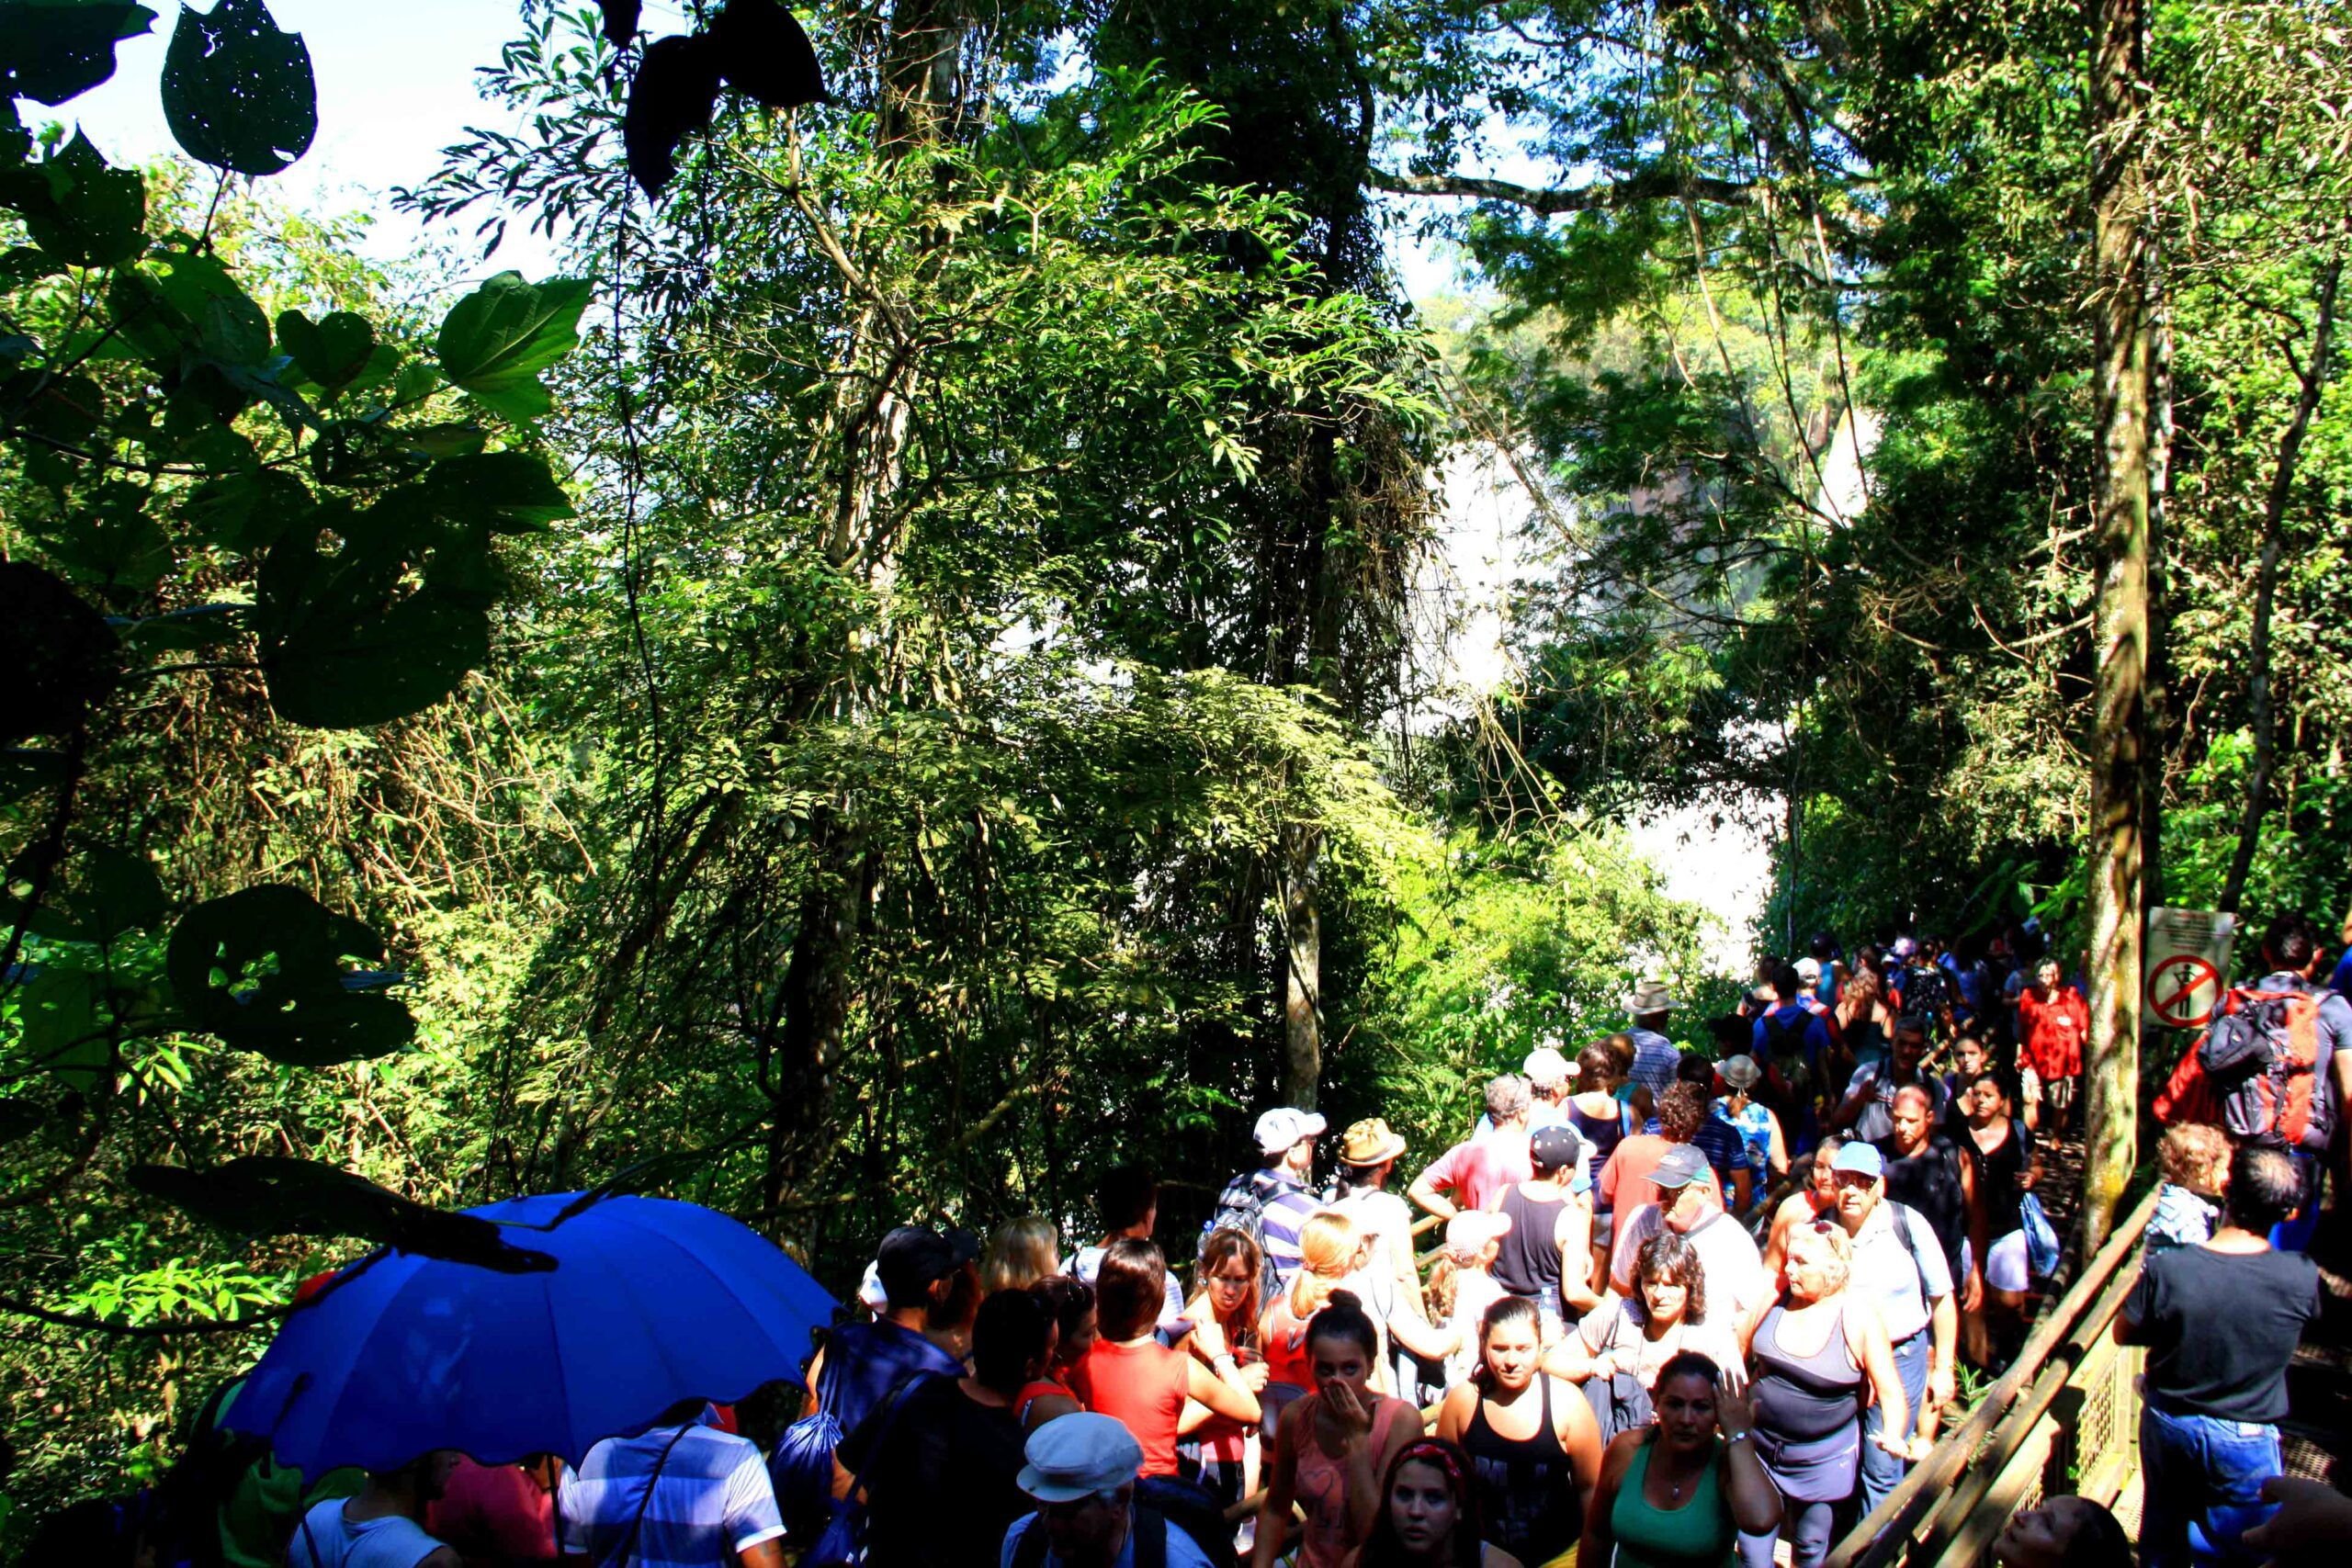 crowd iguazu falls national park semana santa